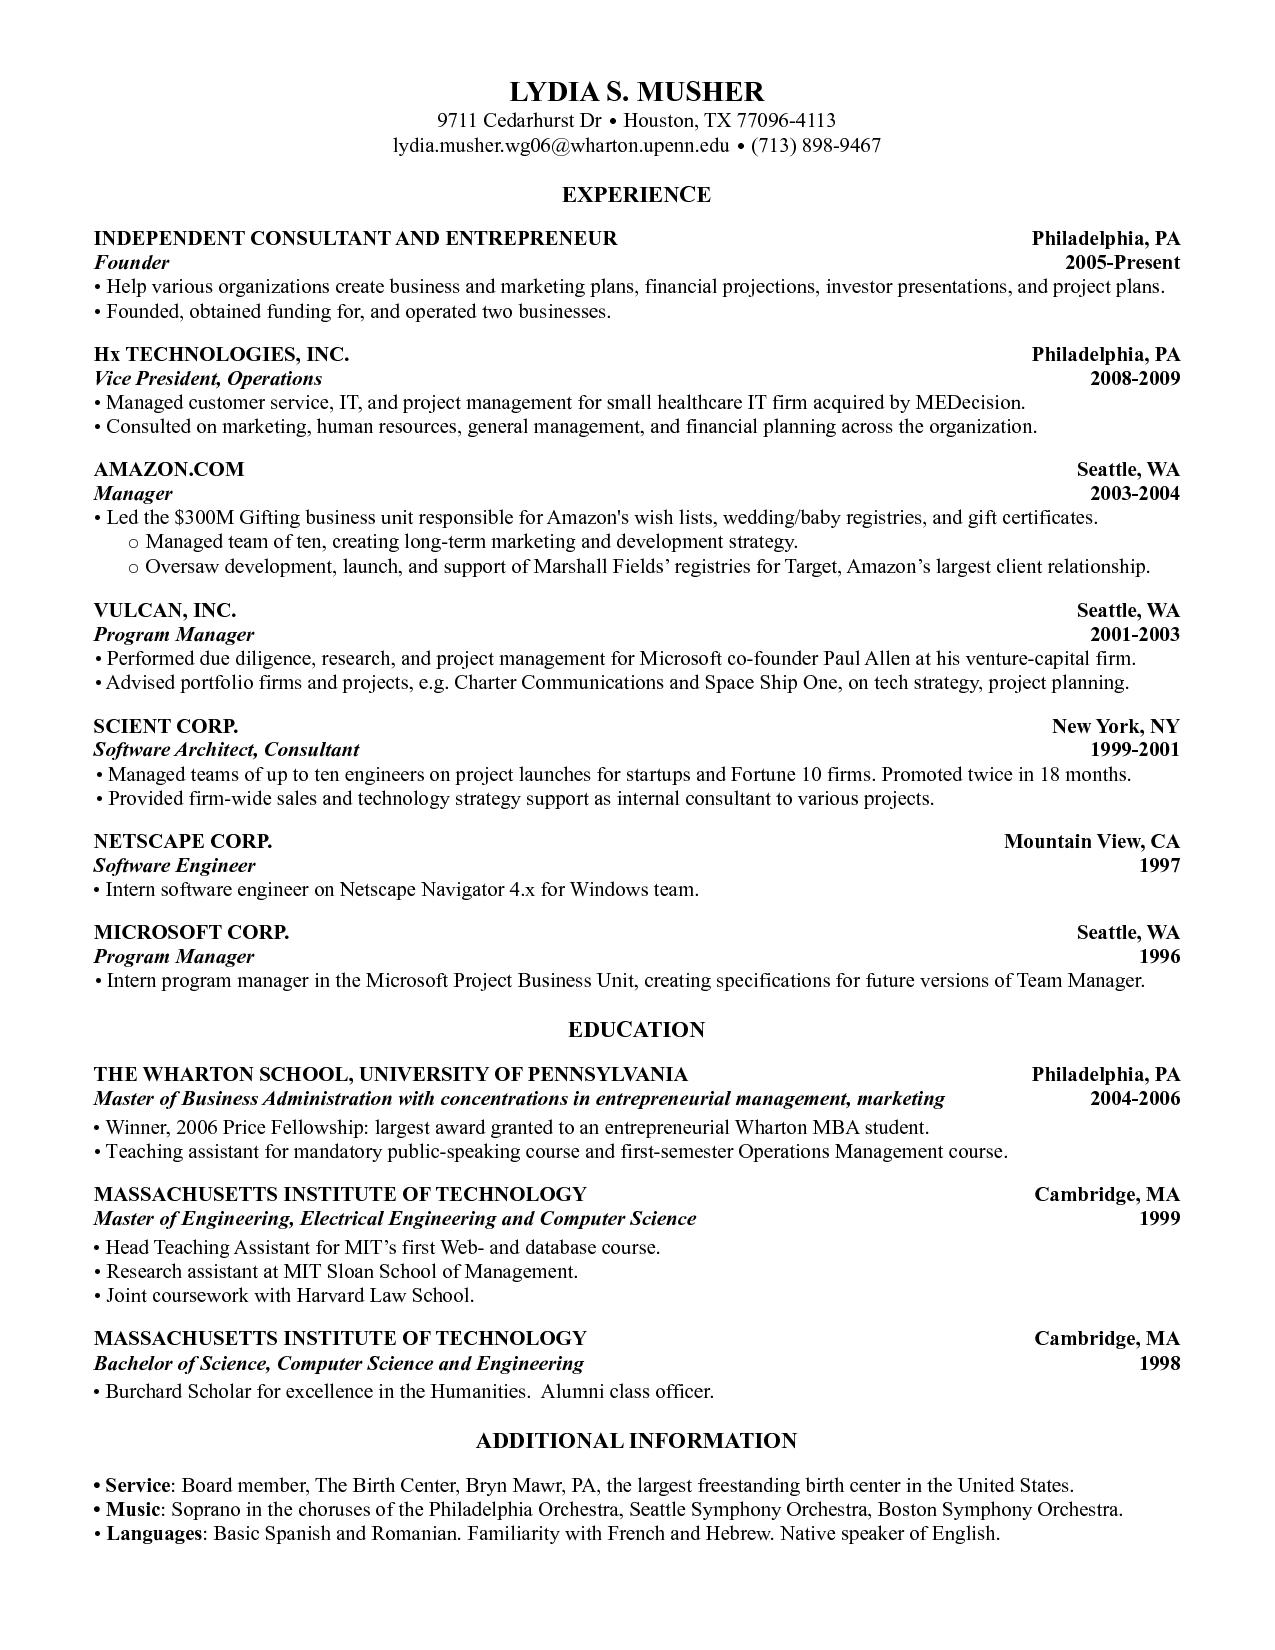 Resume Templates Harvard ResumeTemplates